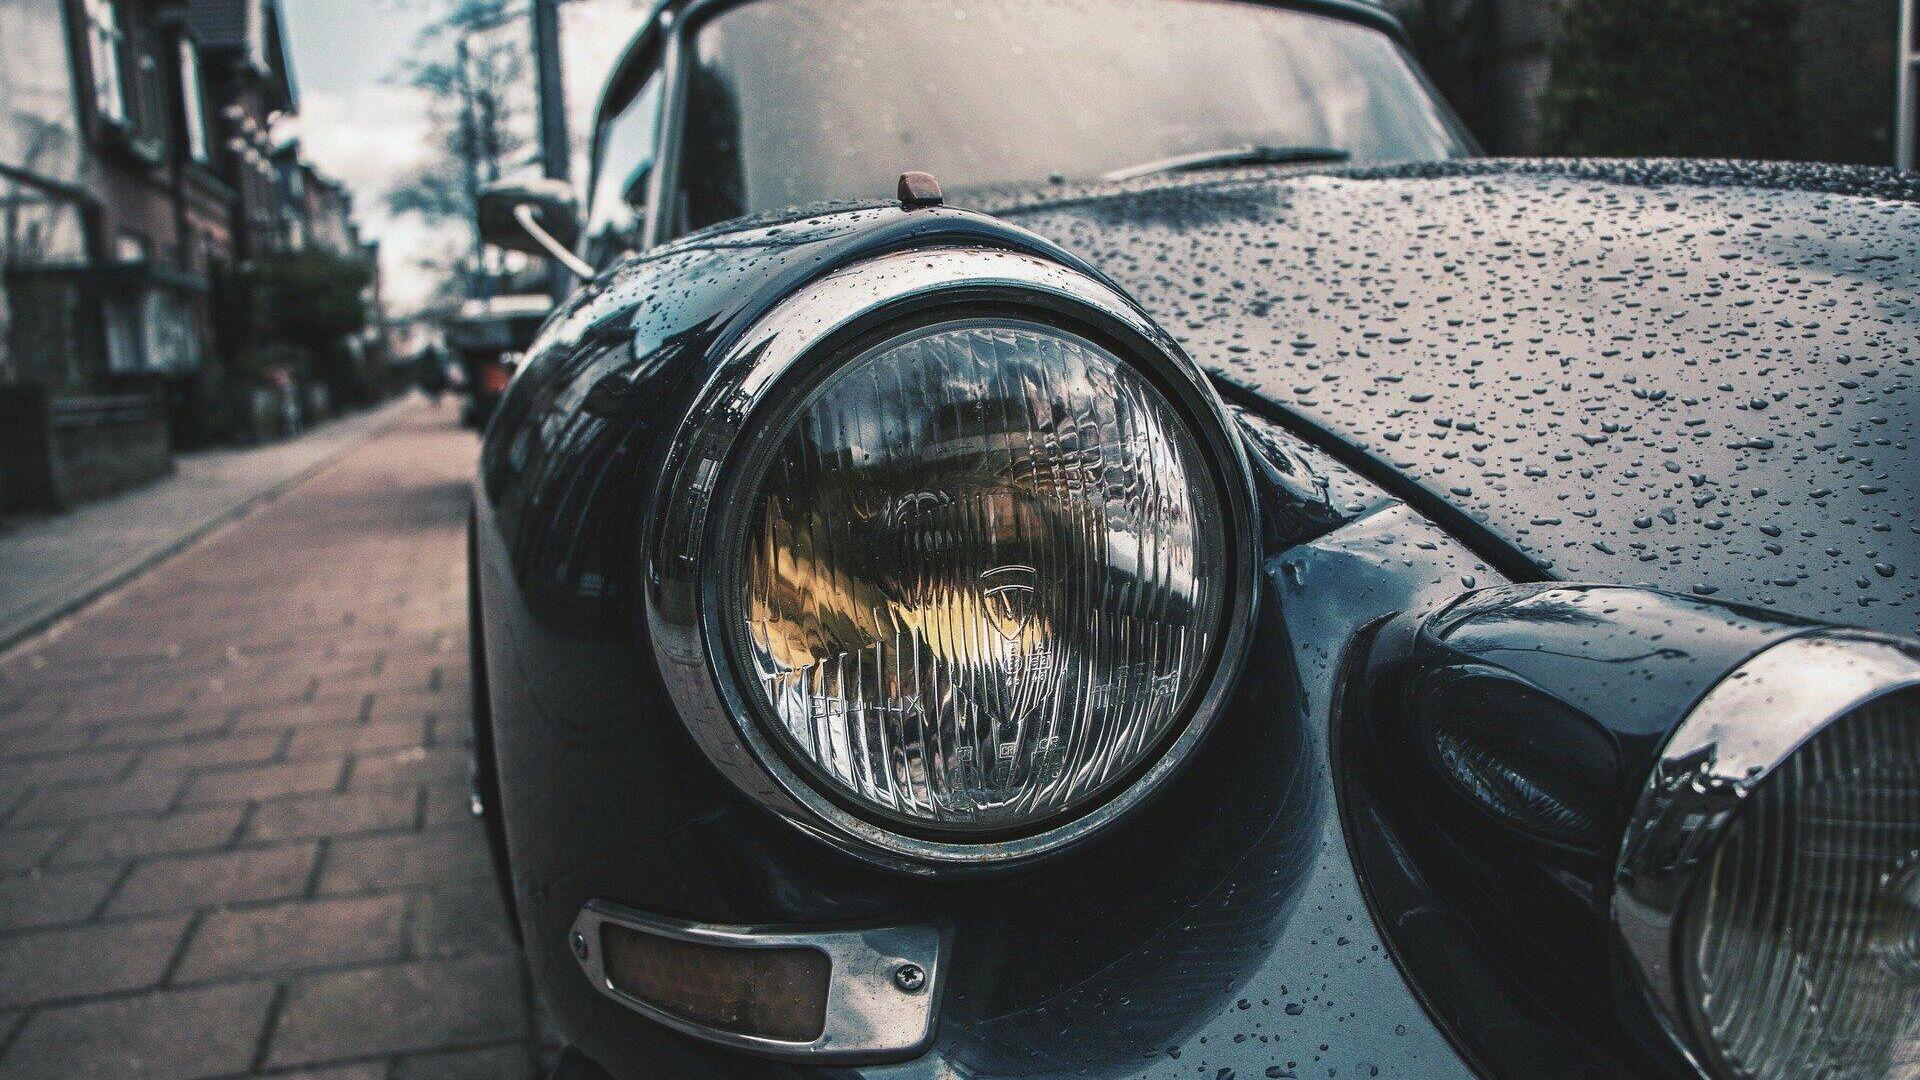 Un coche (imagen referencial) - Sputnik Mundo, 1920, 23.07.2021